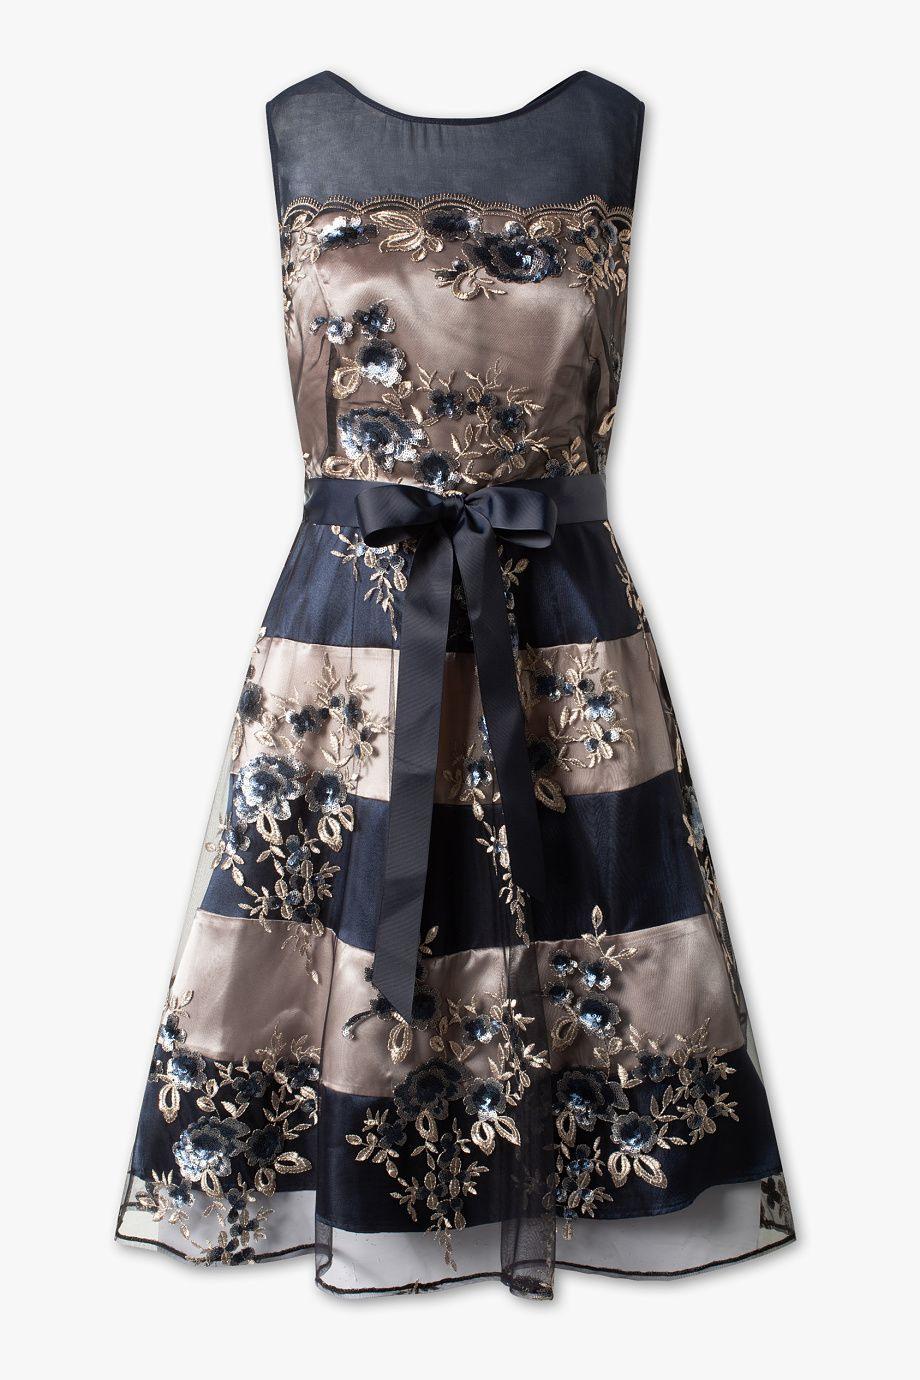 15 Elegant Abendkleider Cunda Vertrieb17 Wunderbar Abendkleider Cunda Vertrieb